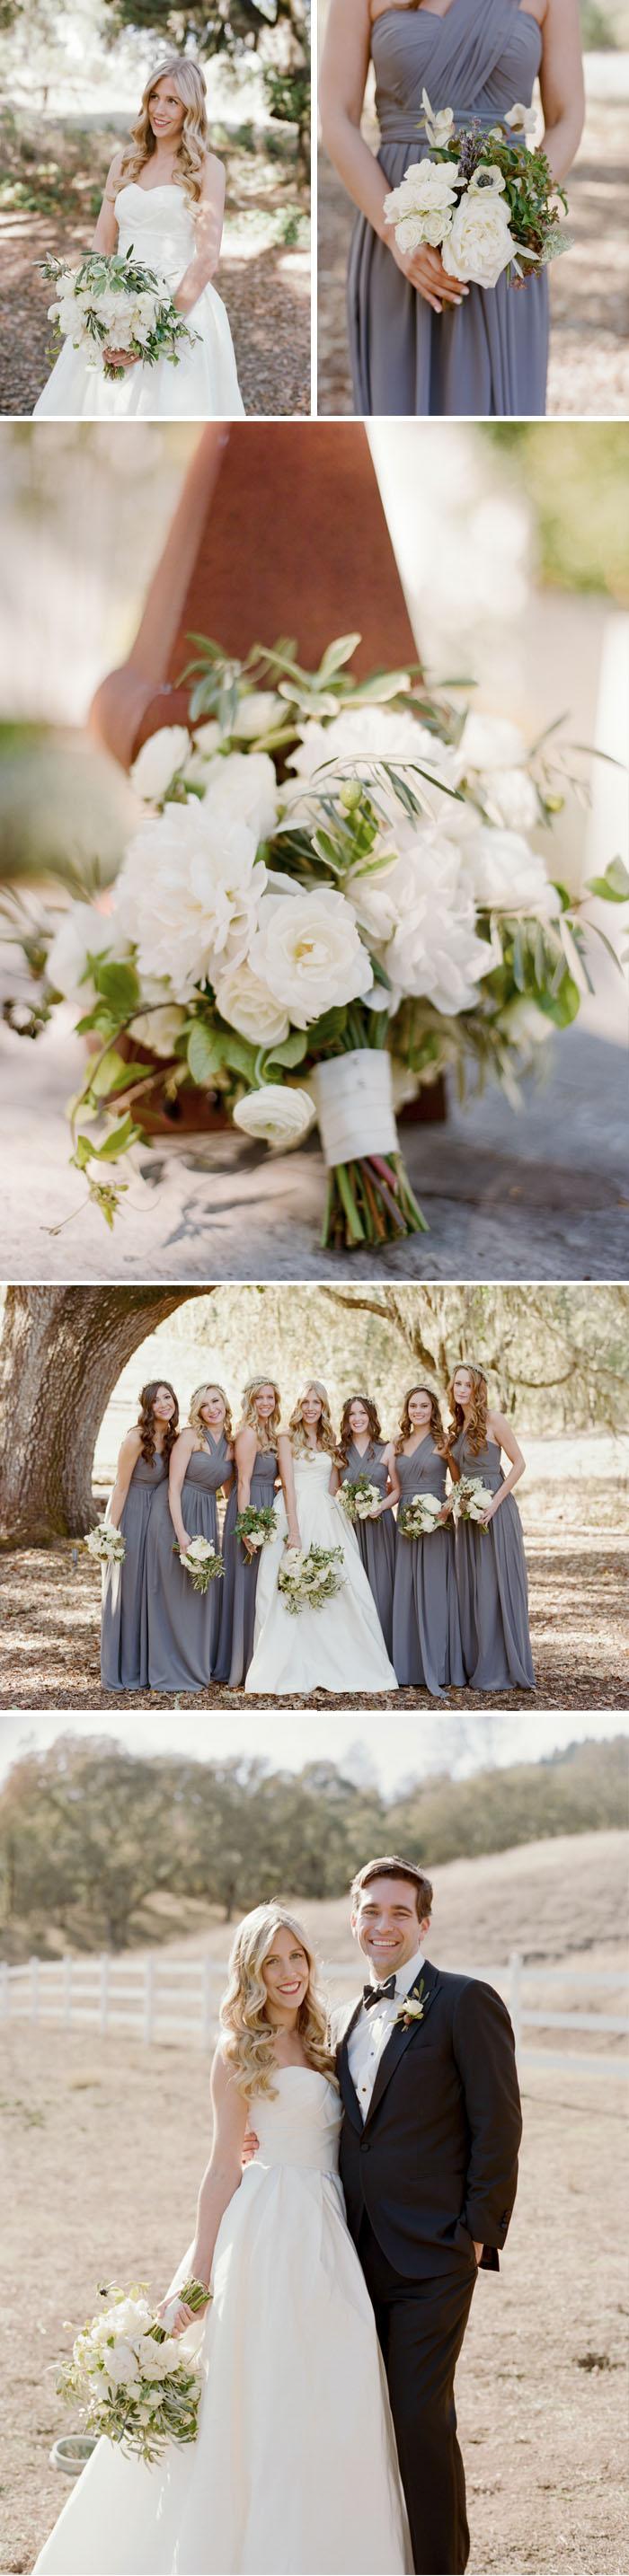 SylvieGil-Durham-Ranch-Organic-Ethereal-Rustic-Bouquet-Bridesmaids-Wedding